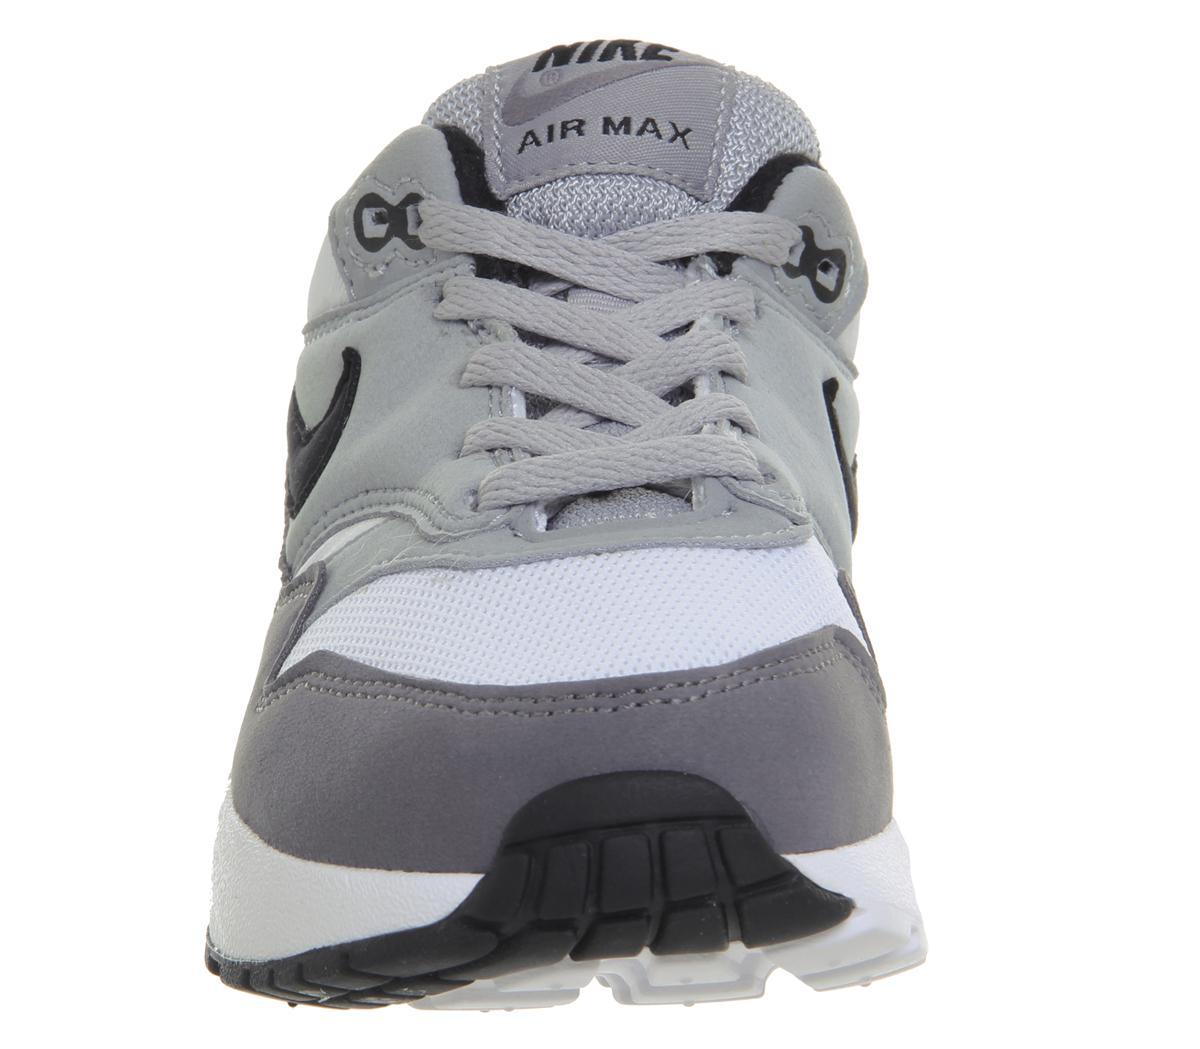 45 Herren Nike Air Max 1 Weiß AH8145 101 Laufschuhe